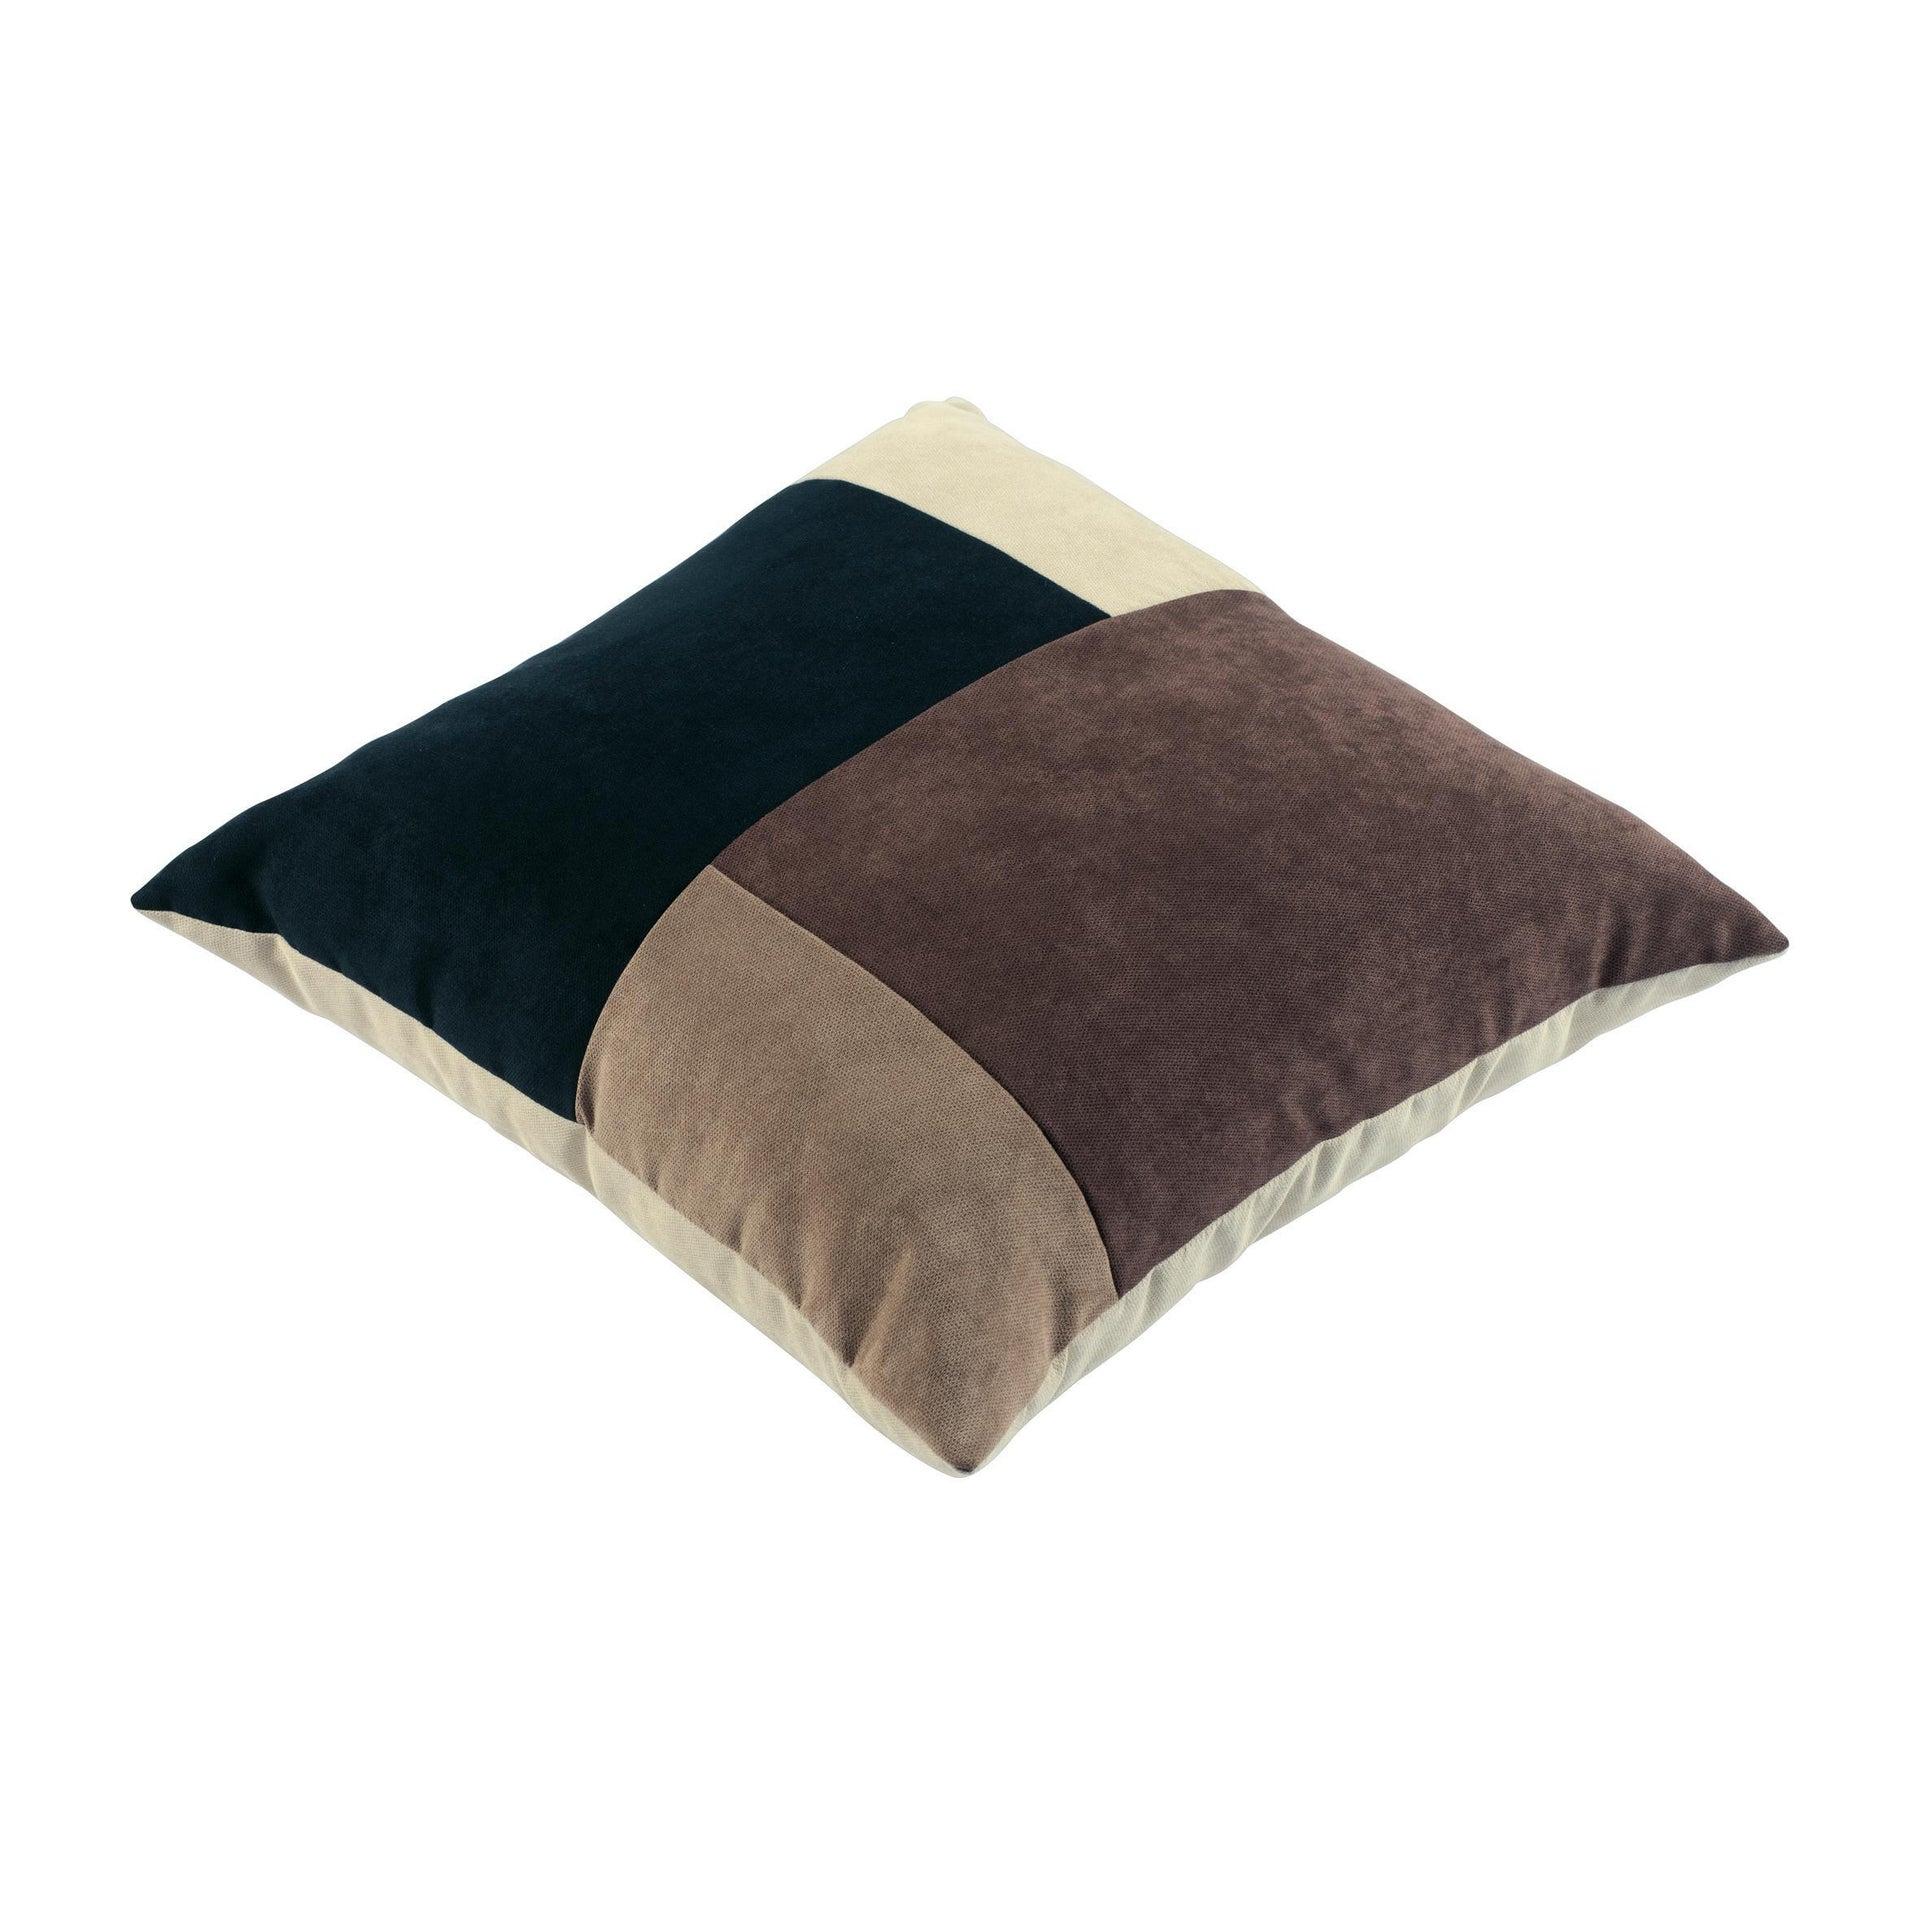 Cuscino Patchwork marrone 60x60 cm - 2